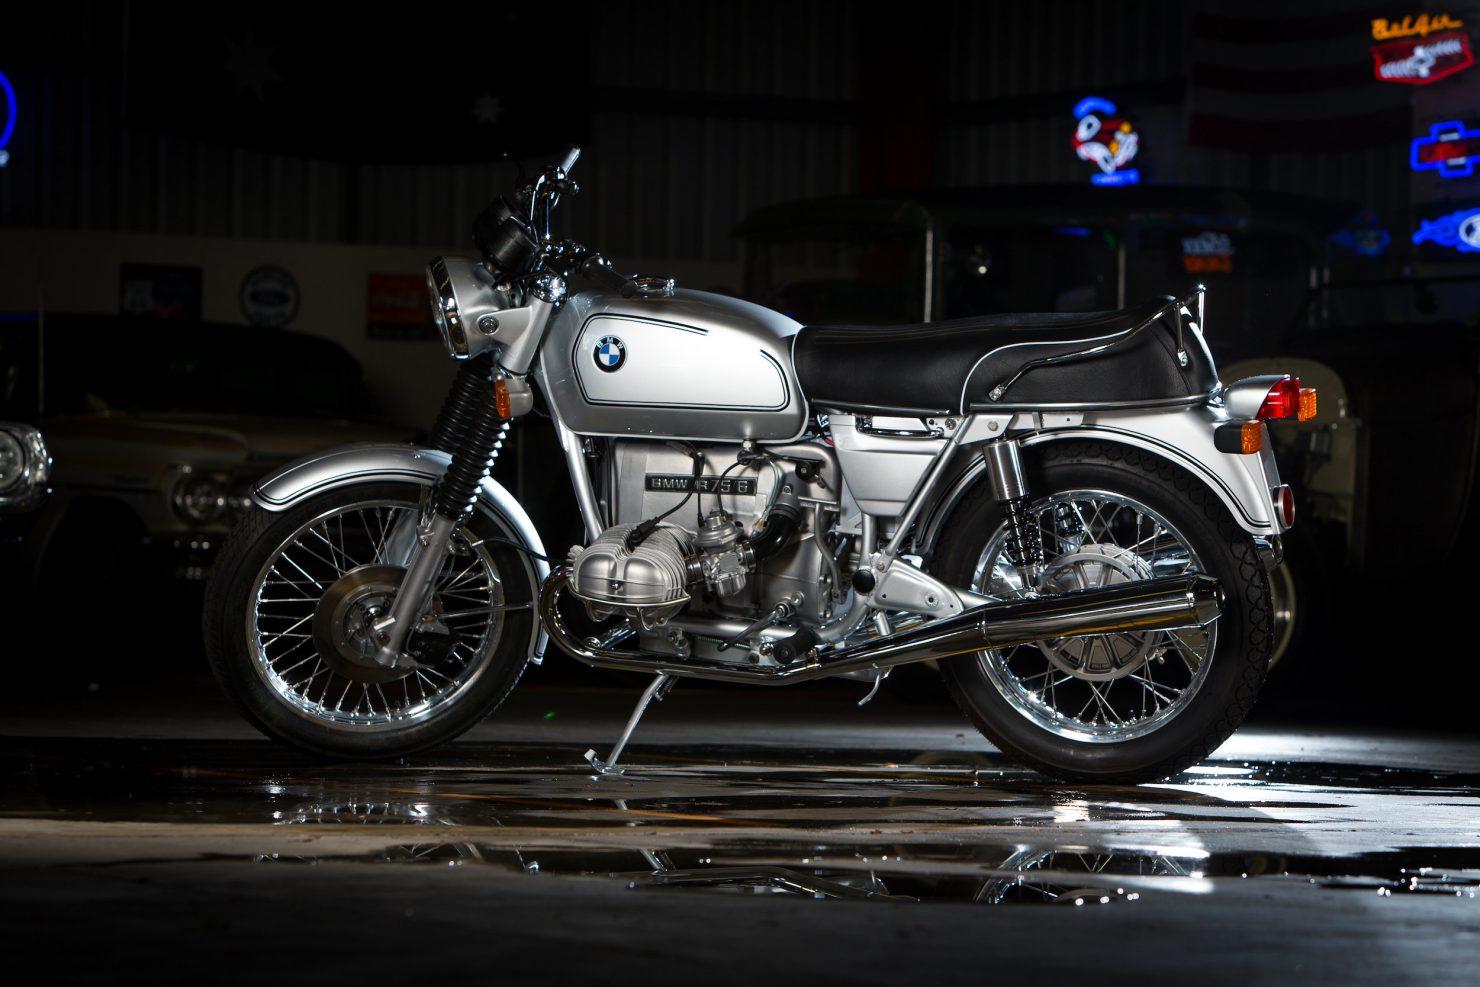 AM6P0562 1480x987 - Immaculately Restored: BMW R75/6